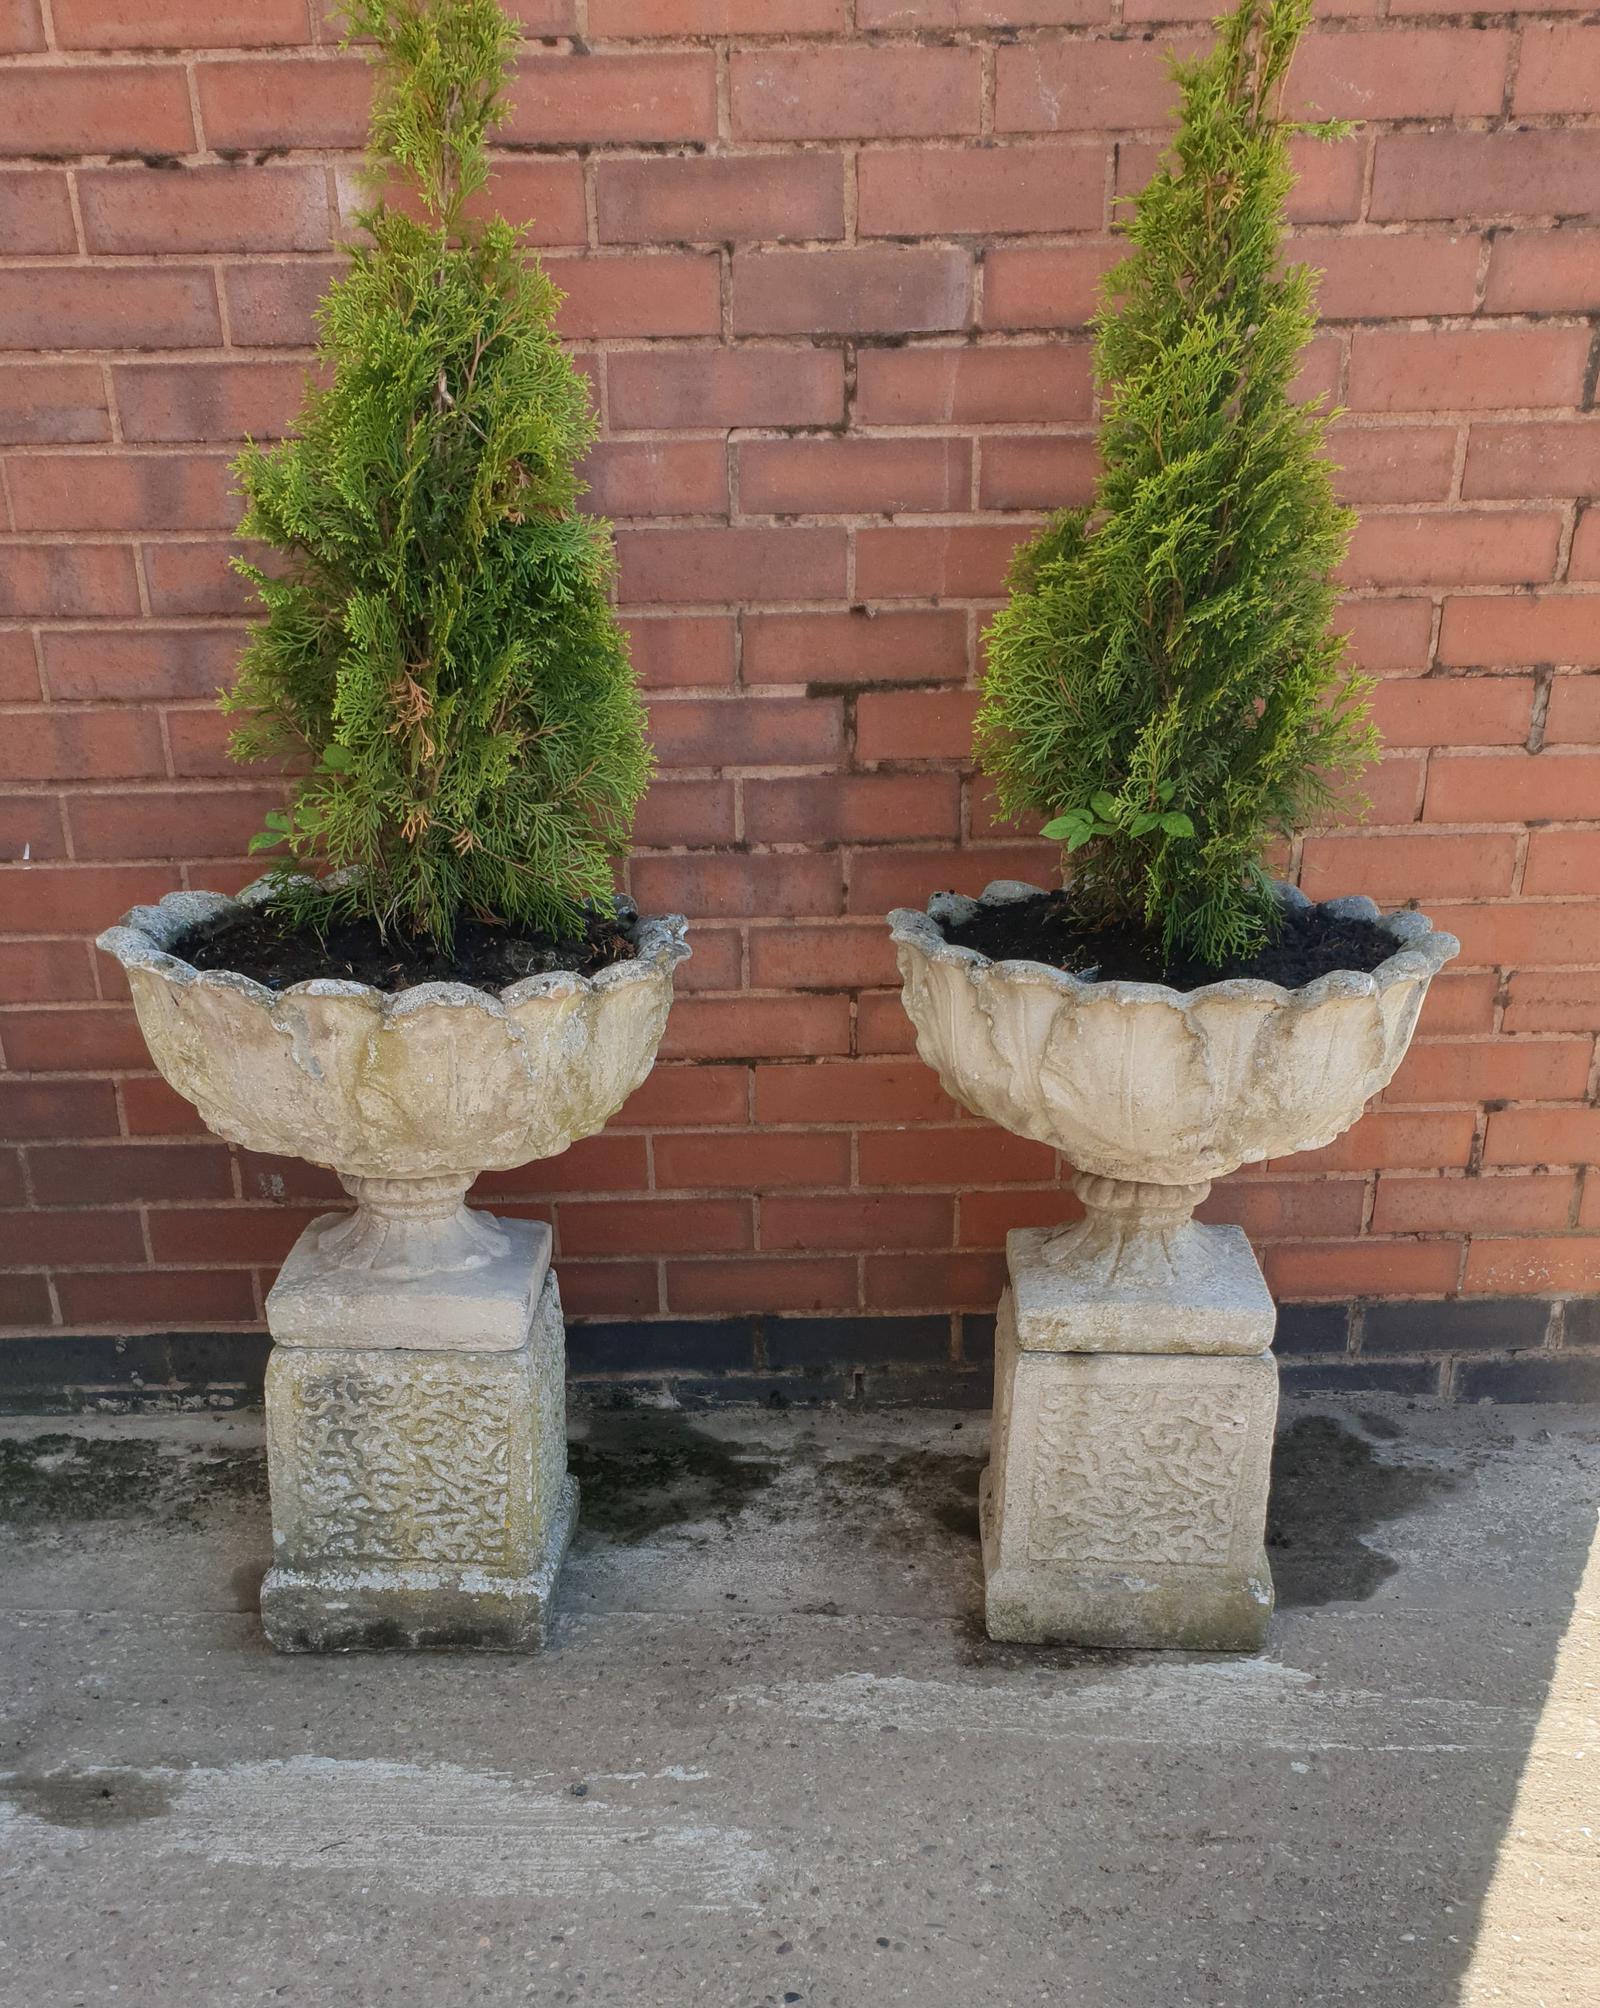 Pair of Garden Urns on Plinths (1 of 1)